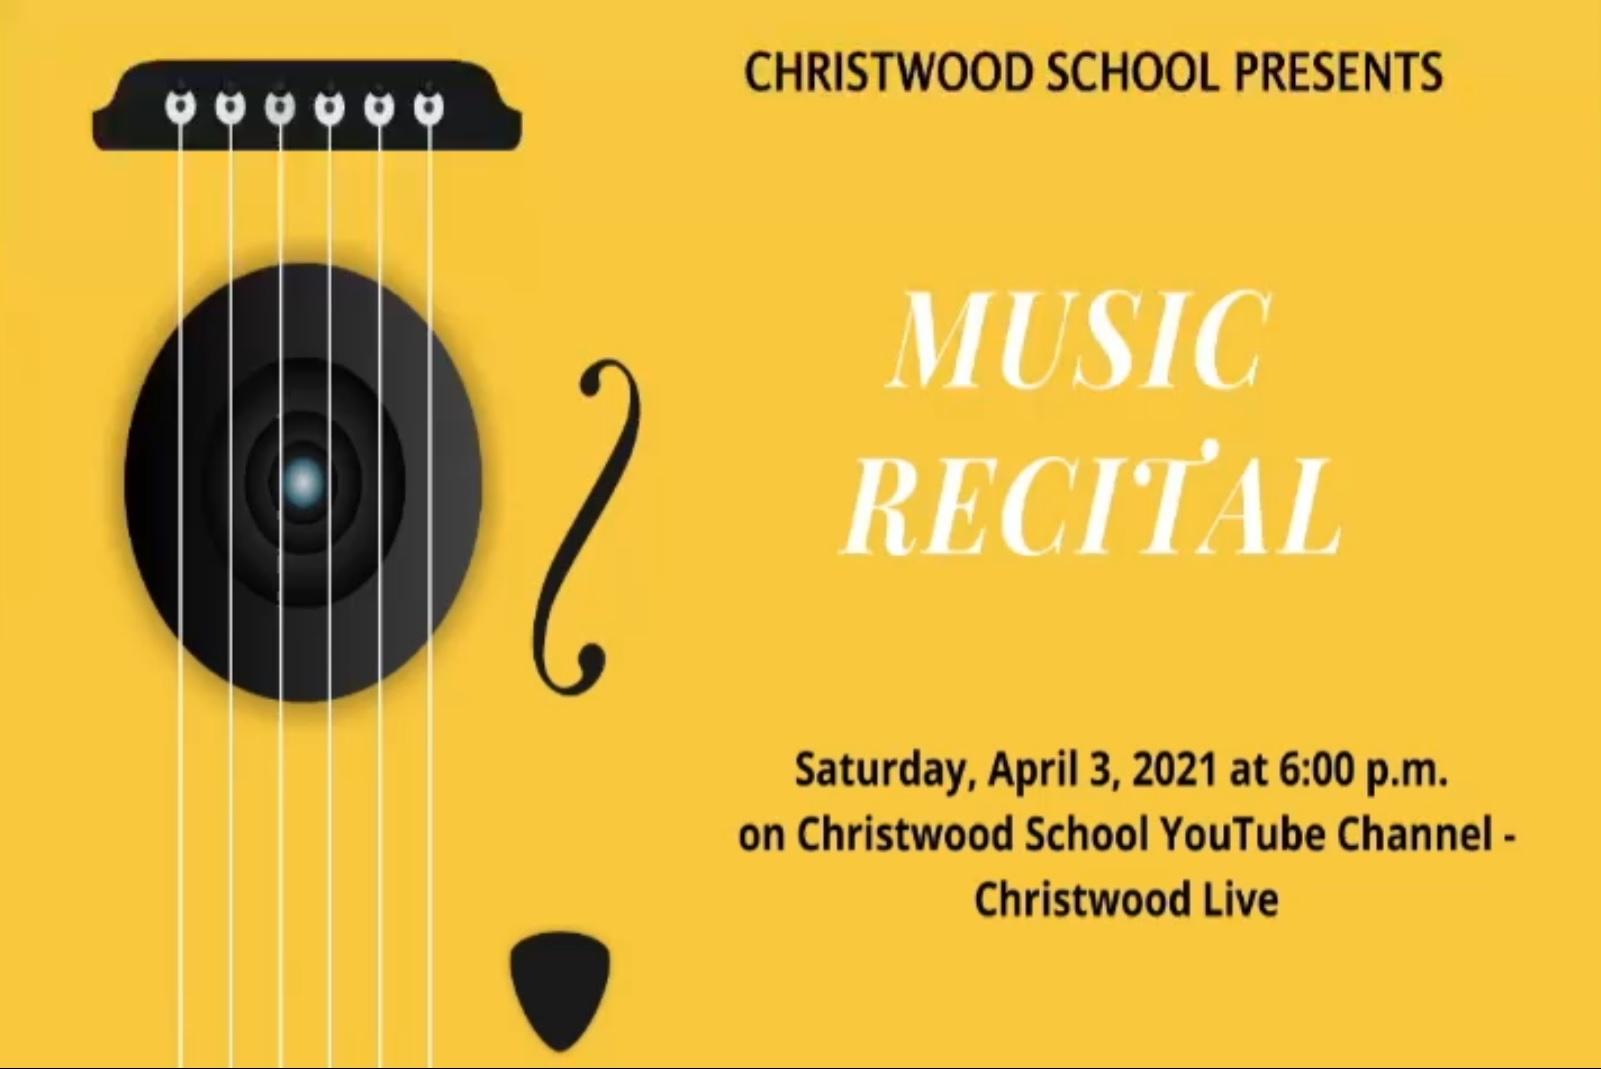 MUSIC RECITAL - April 3, 2021